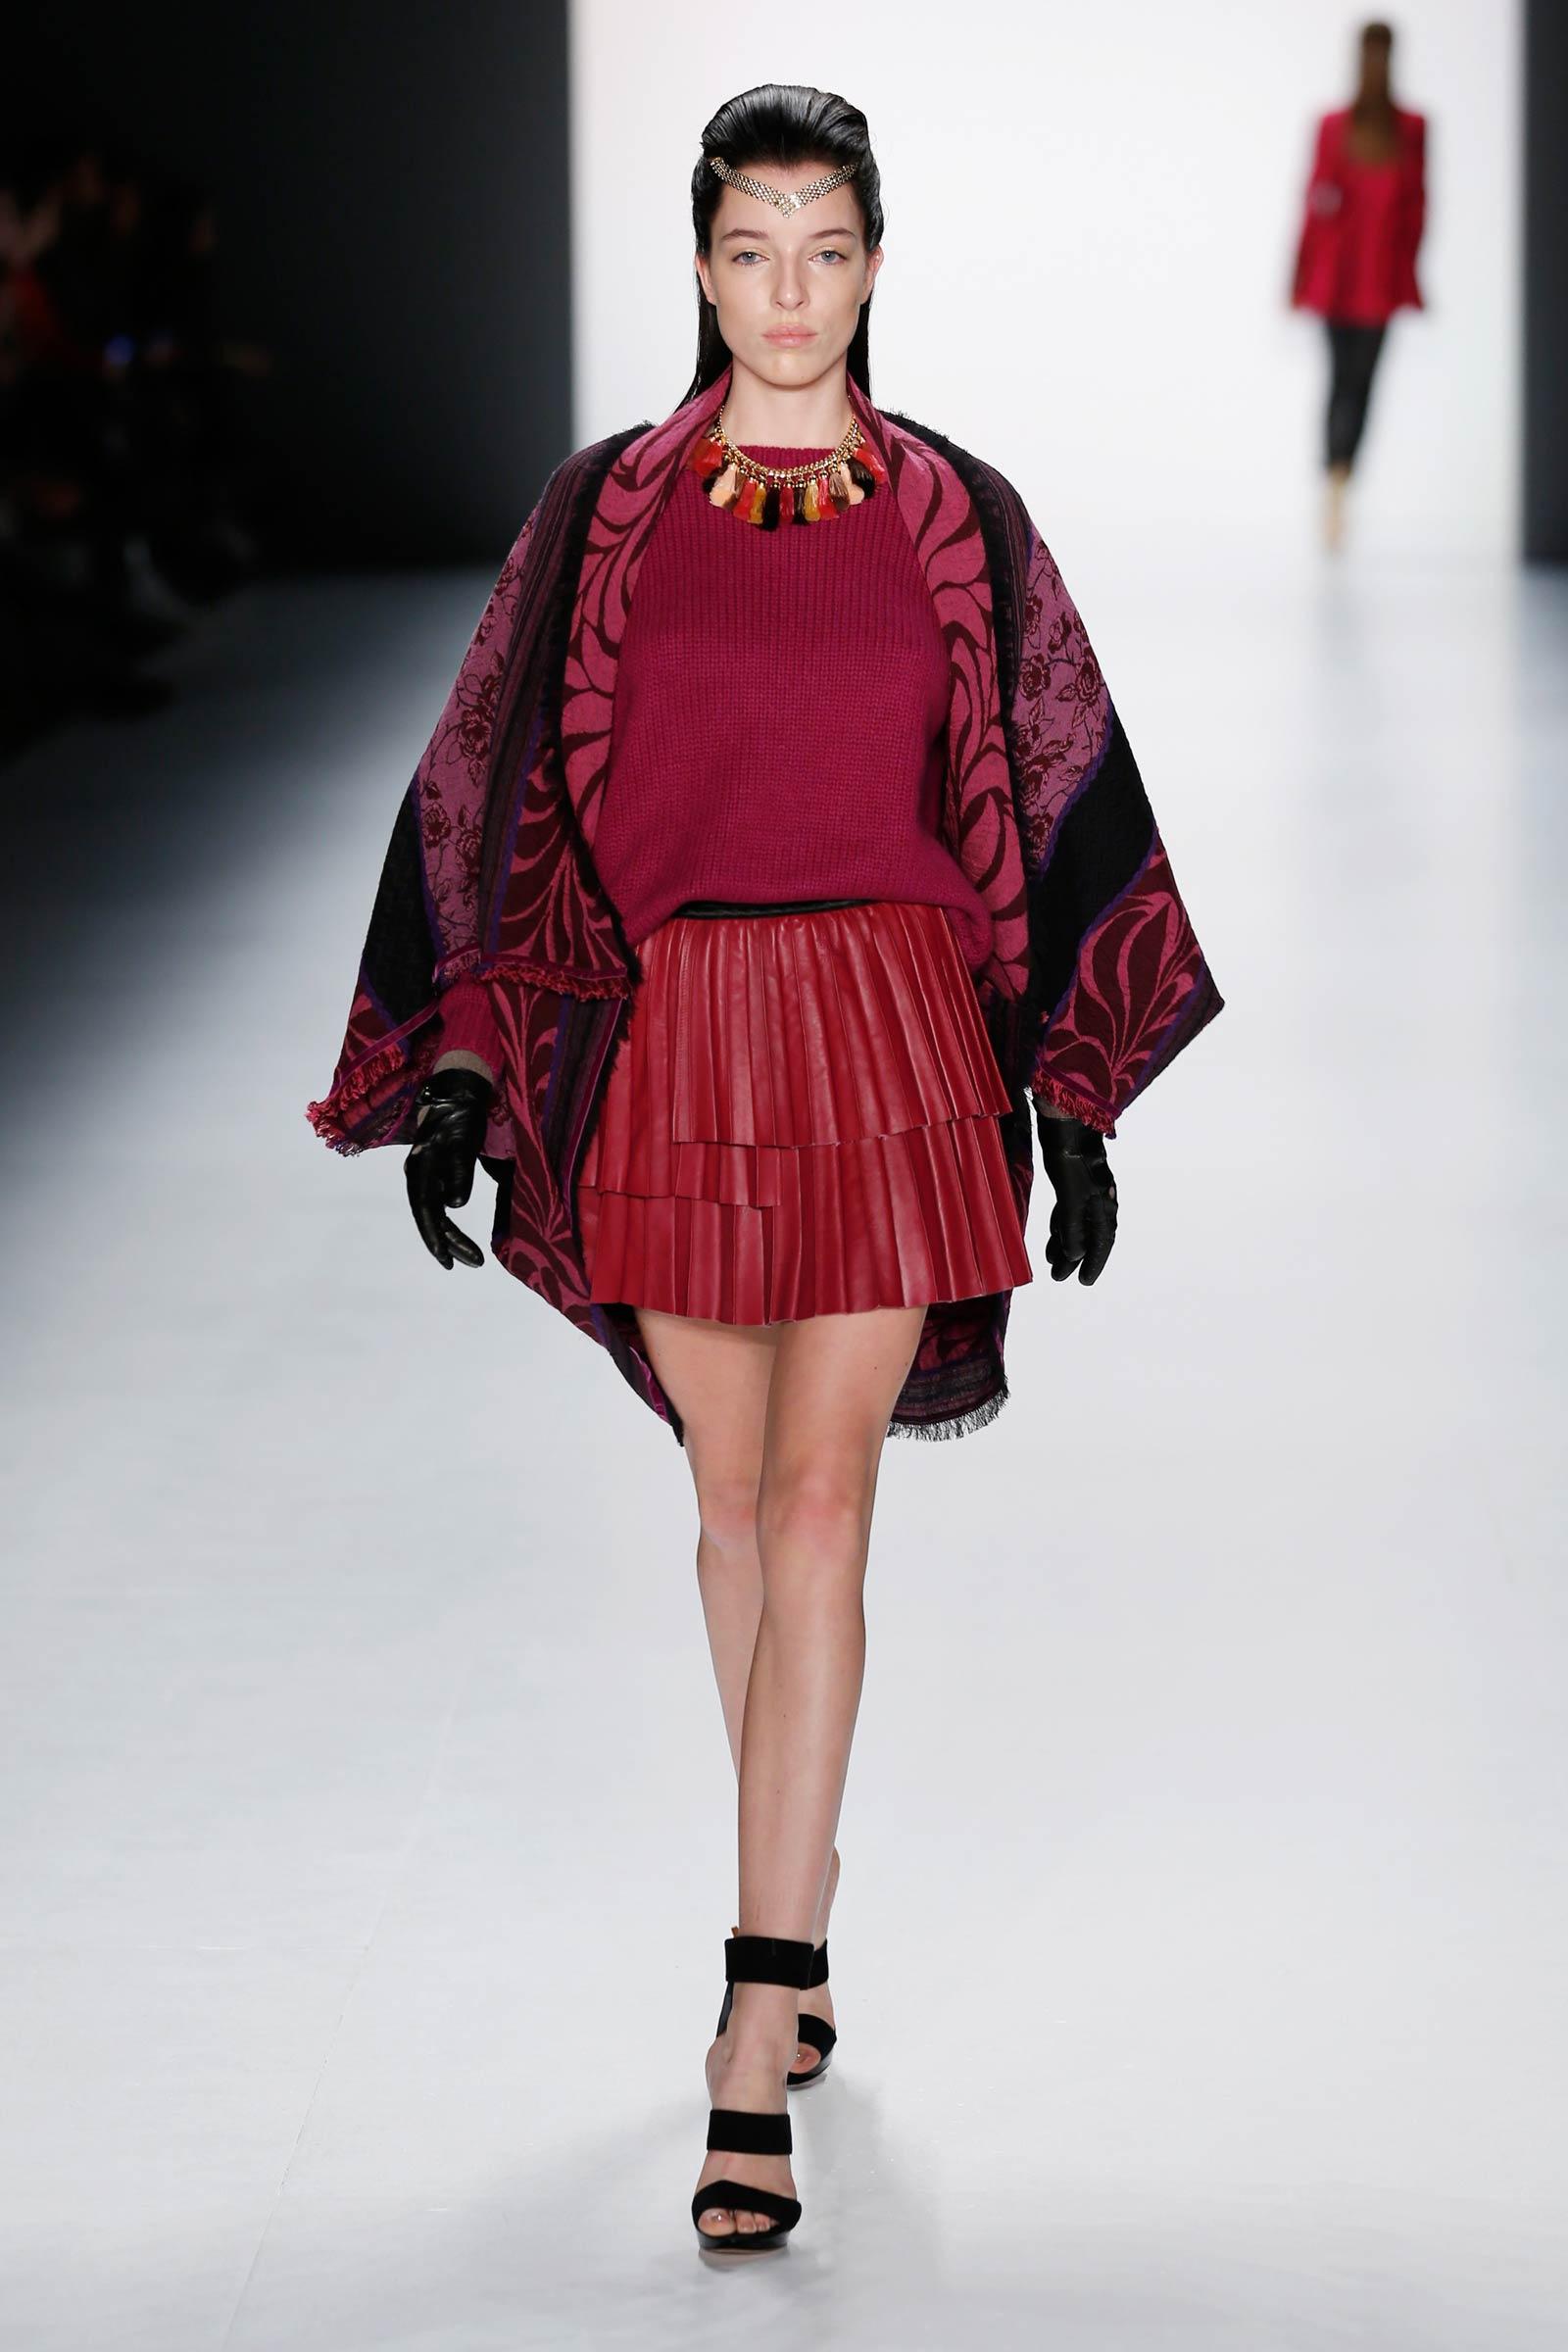 Models on the catwalk at Mercedes Benz Fashion Week